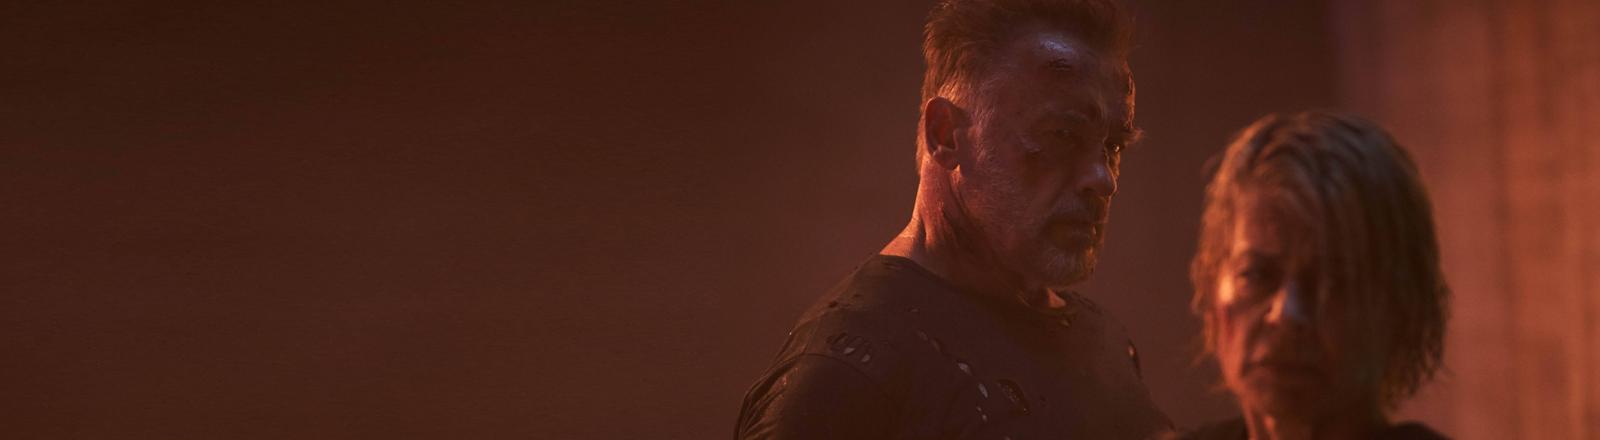 "Szene aus ""Terminator: Dark Fate"" mit Arnold Schwarzenegger und Linda Hamilton"